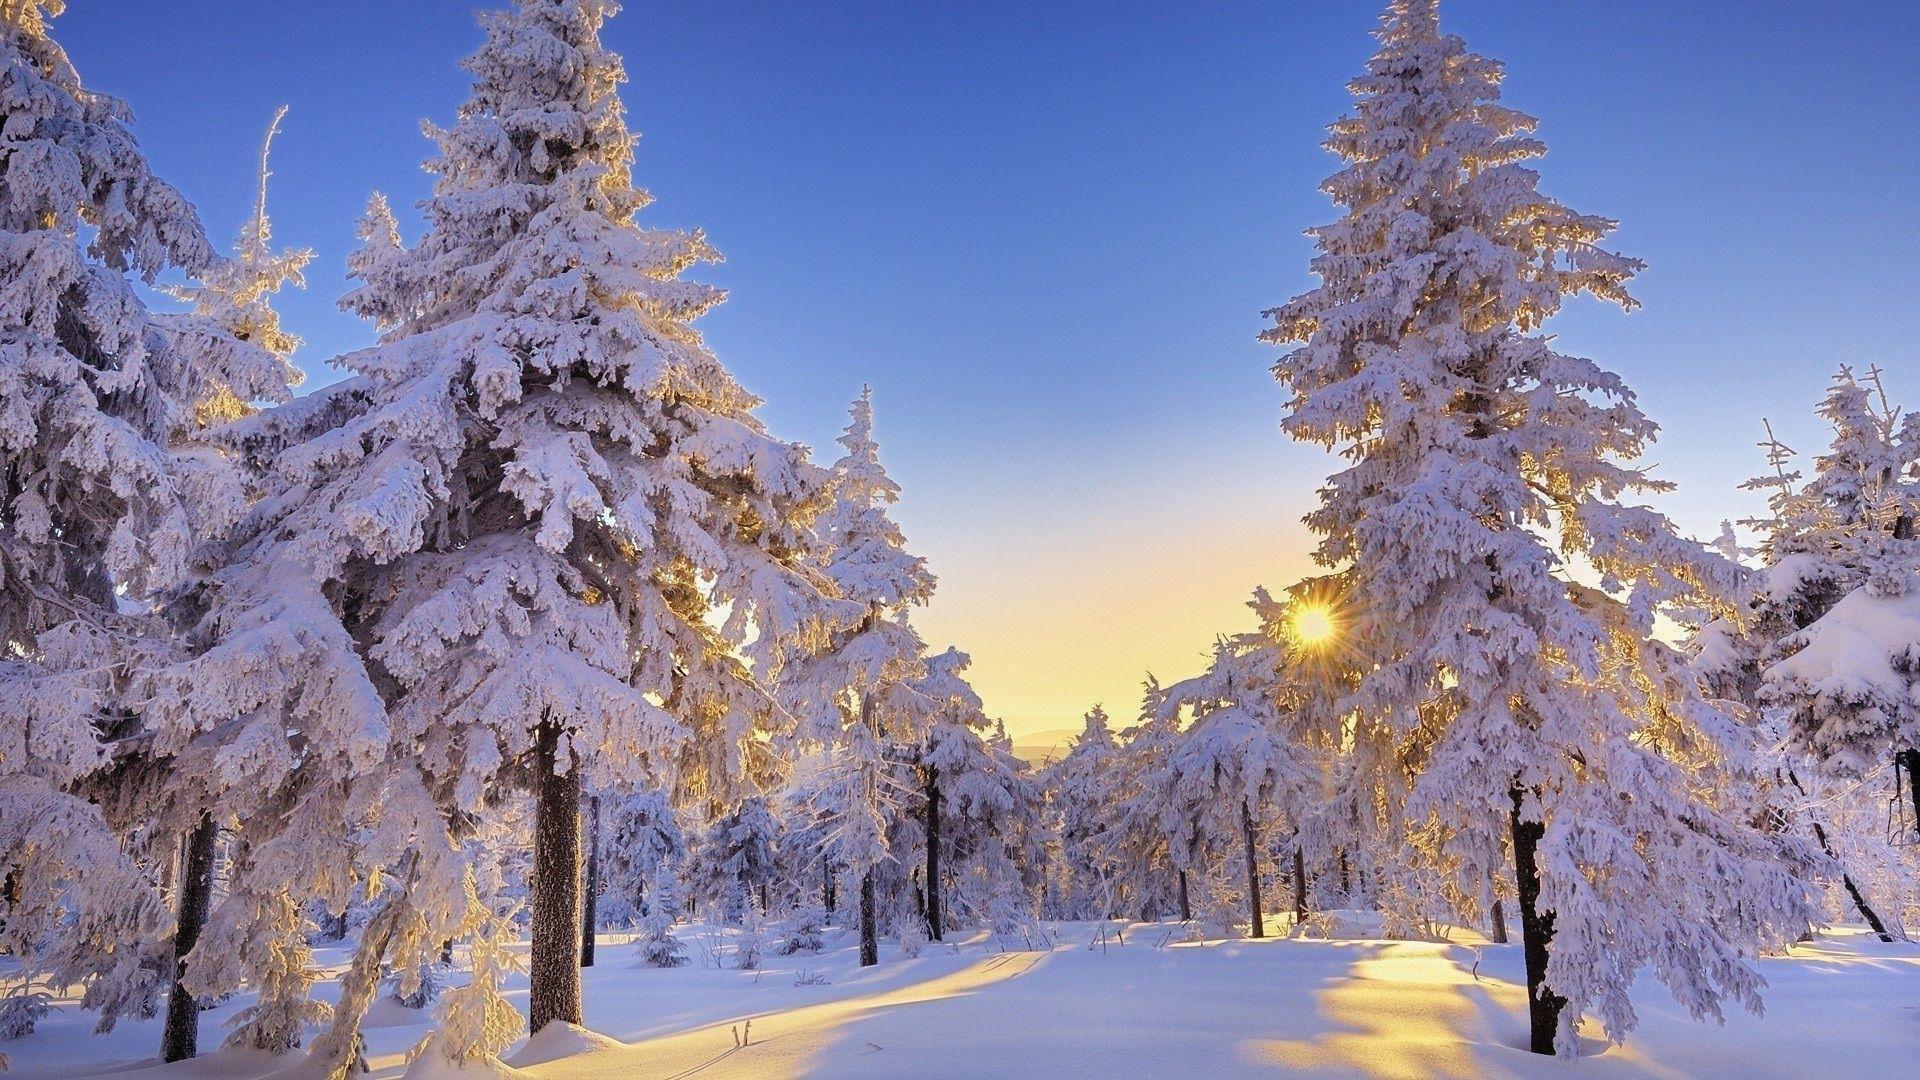 Winter Wonderland High Quality